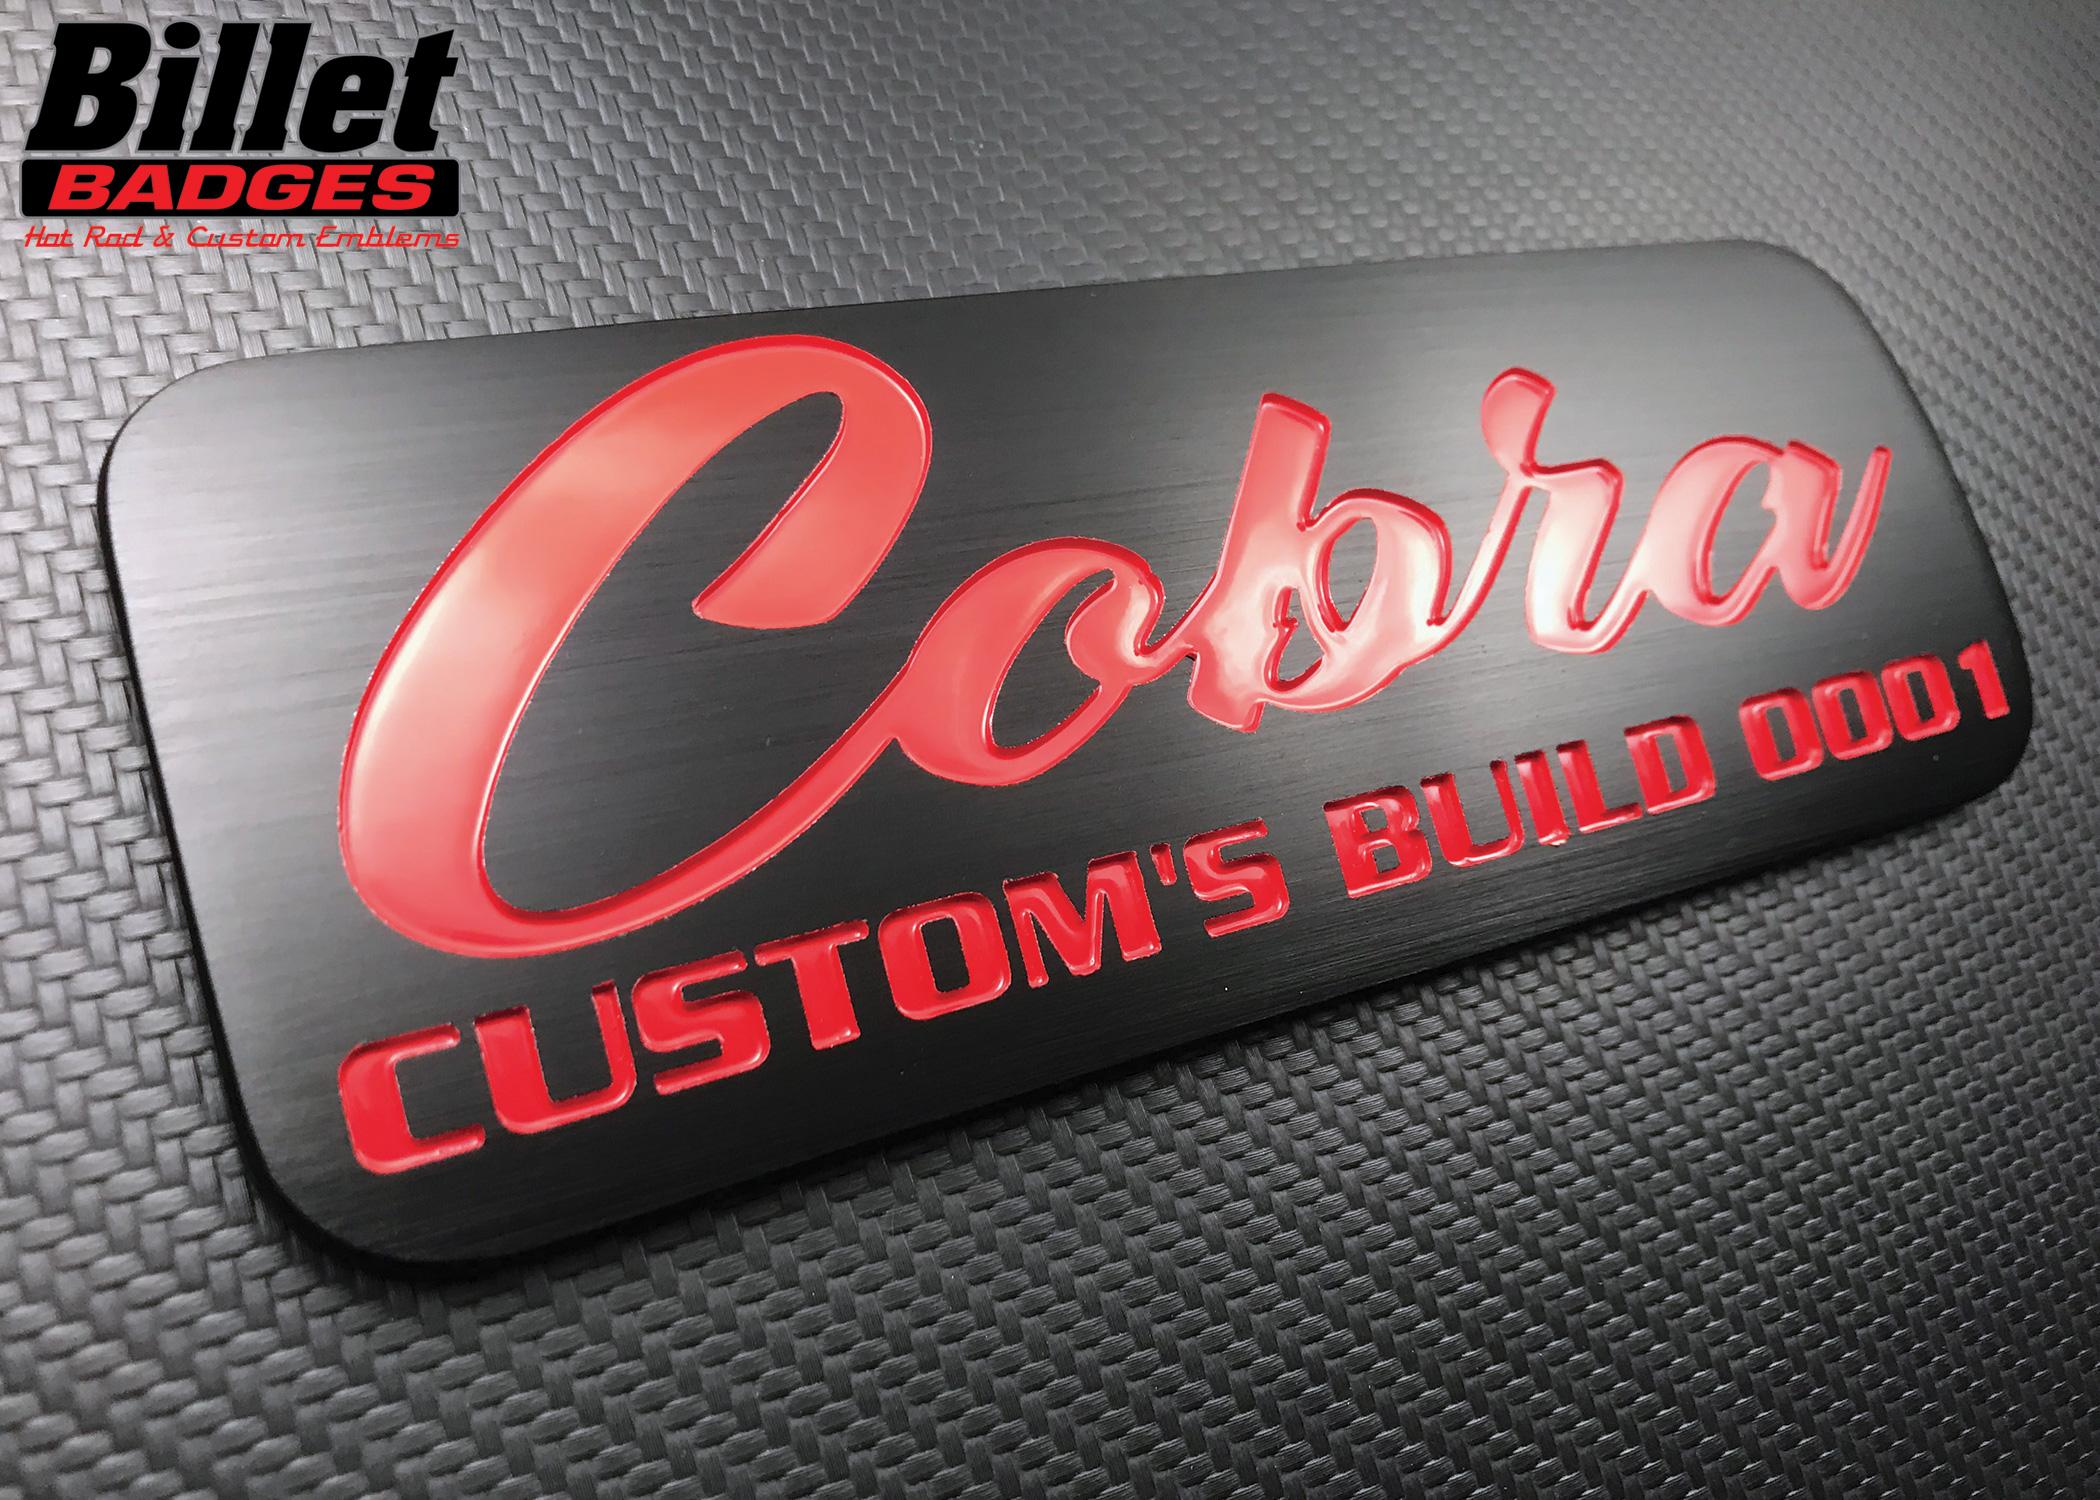 Cobra Custom's Build 0001